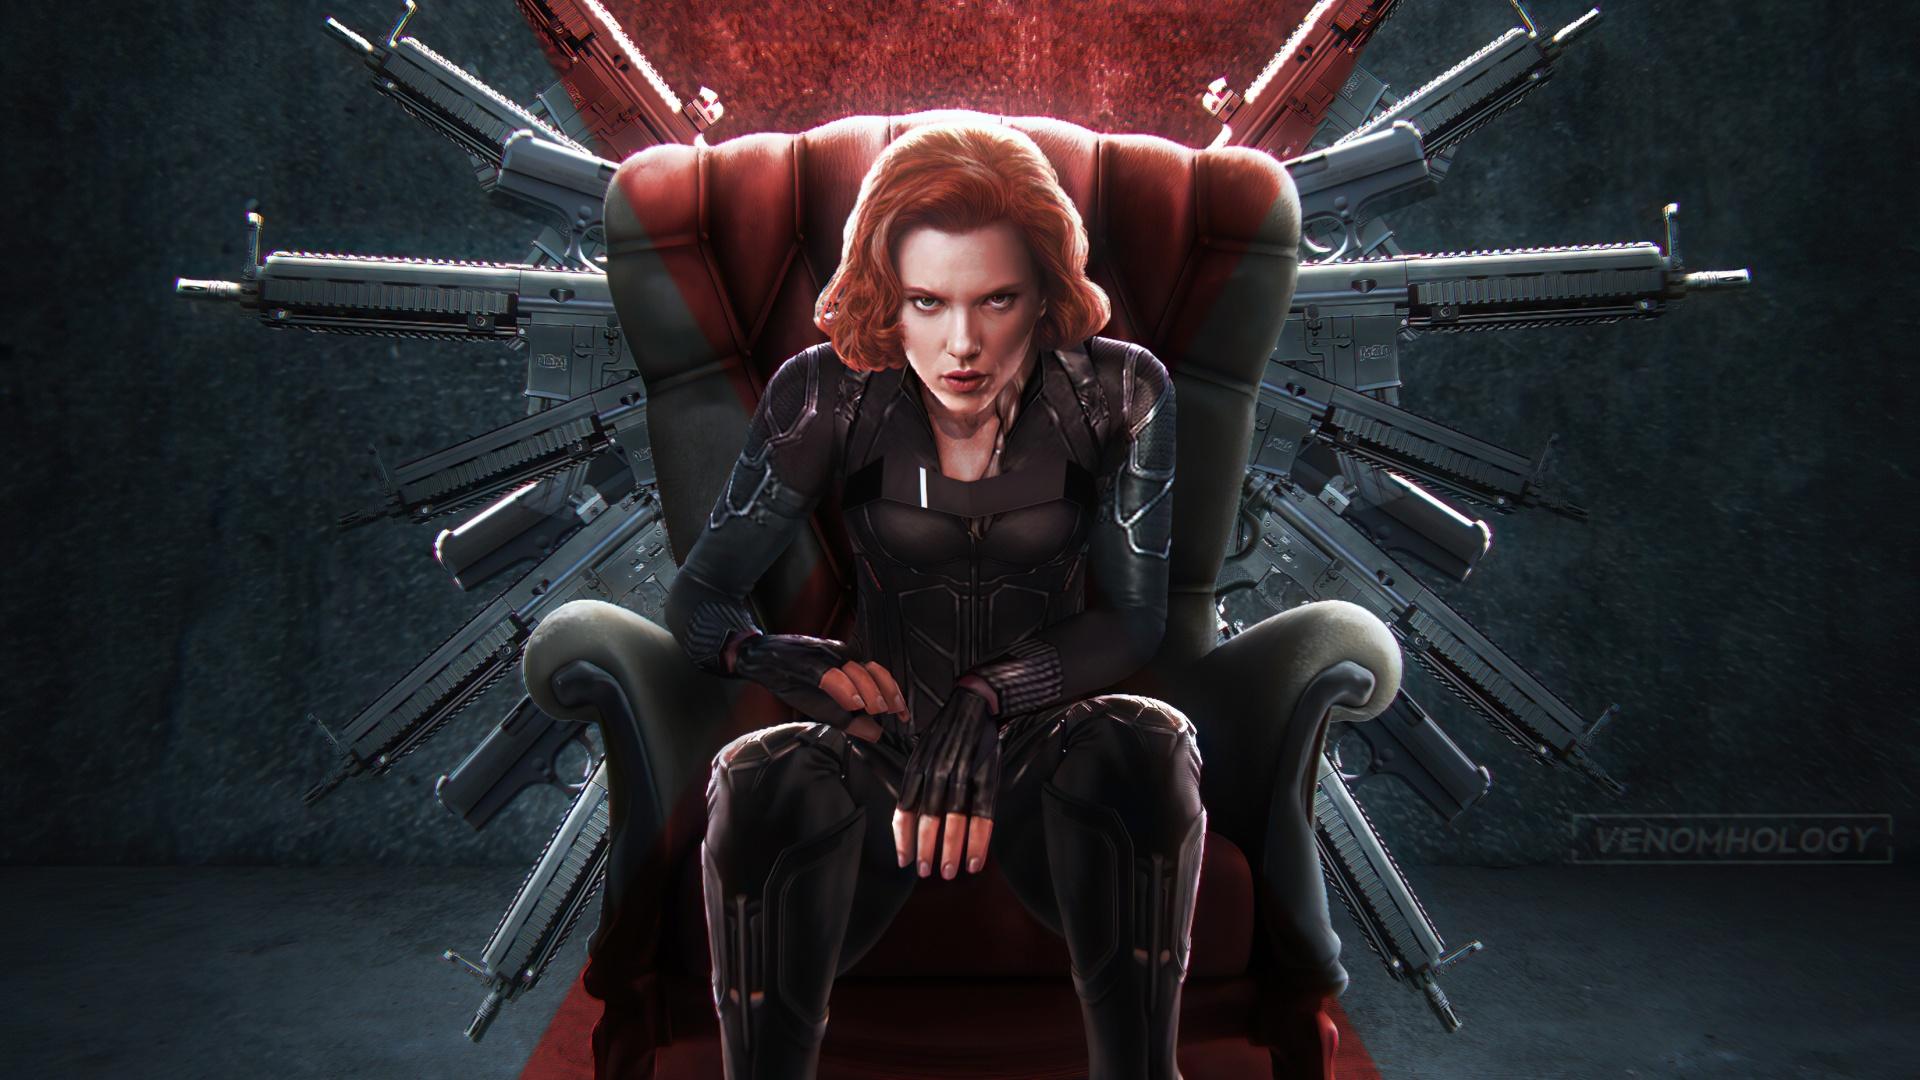 Black Widow pc wallpaper